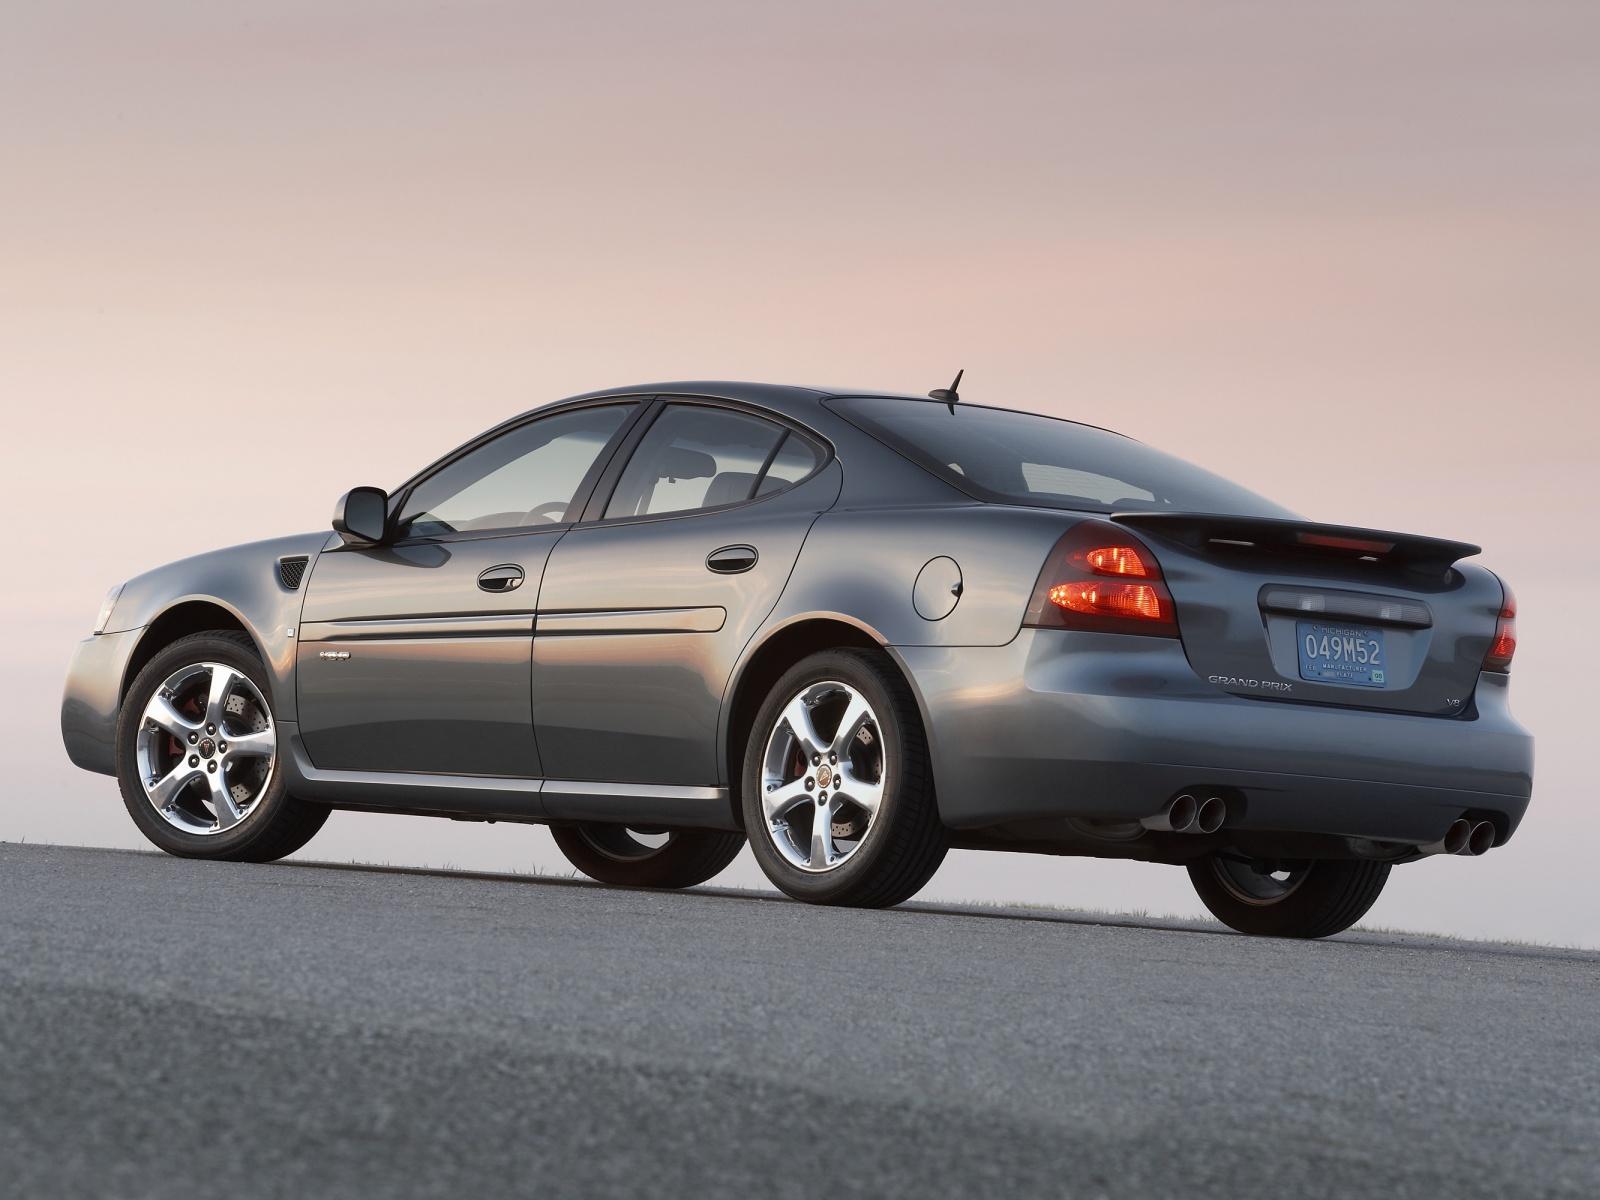 2007 Pontiac Grand Prix GXP | Motor Desktop